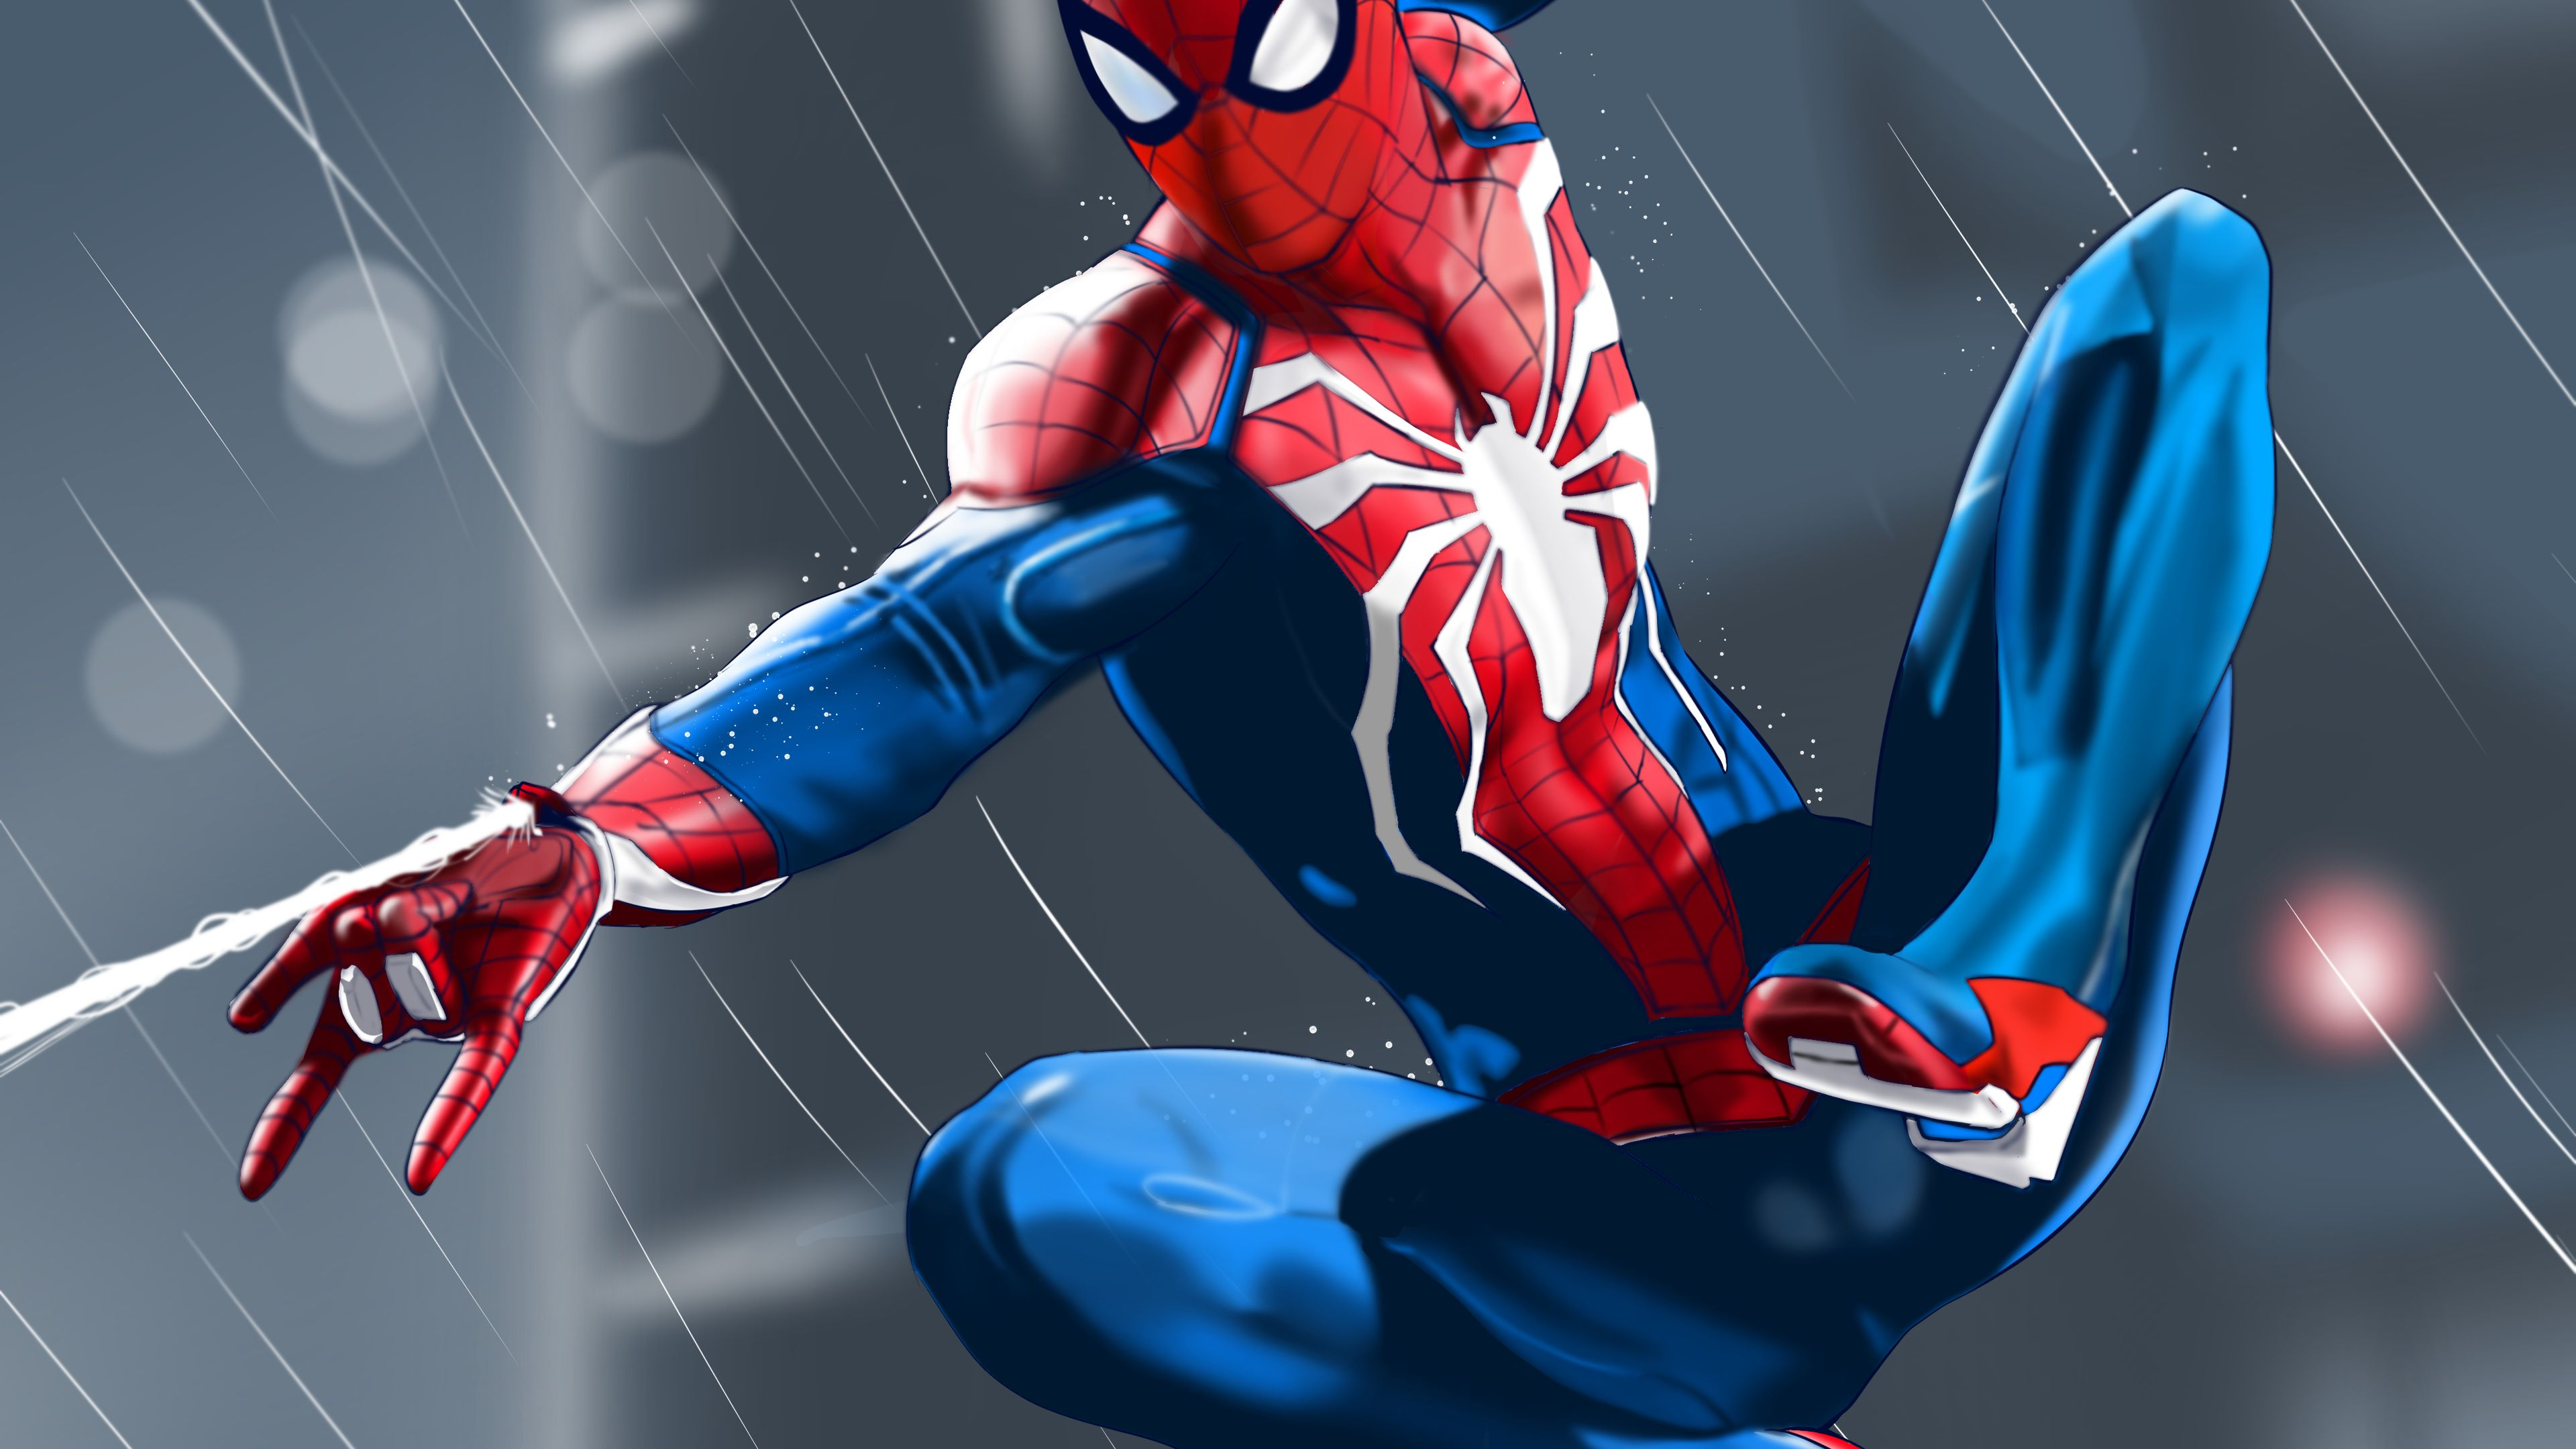 Spider Man 4k Superheroes Wallpapers Spiderman Wallpapers Hd Wallpapers Digital Art Wallpapers Artwork Wallpapers Art Wa Spiderman Superhero Art Wallpaper